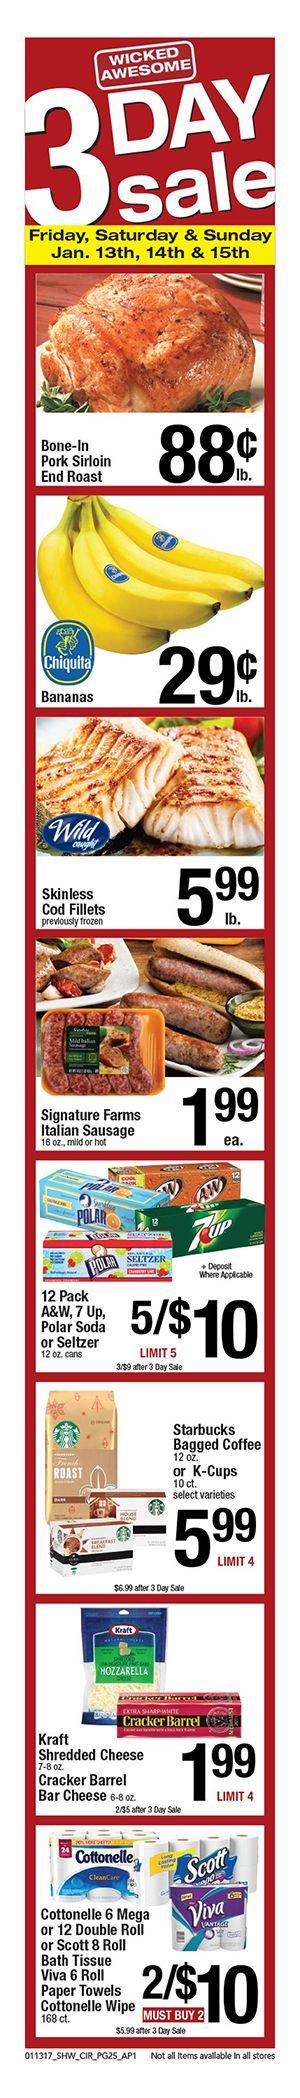 Shaws 3 Day Sale January 13 - 19, 2017 - http://www.olcatalog.com/grocery/shaws-3-day-sale.html